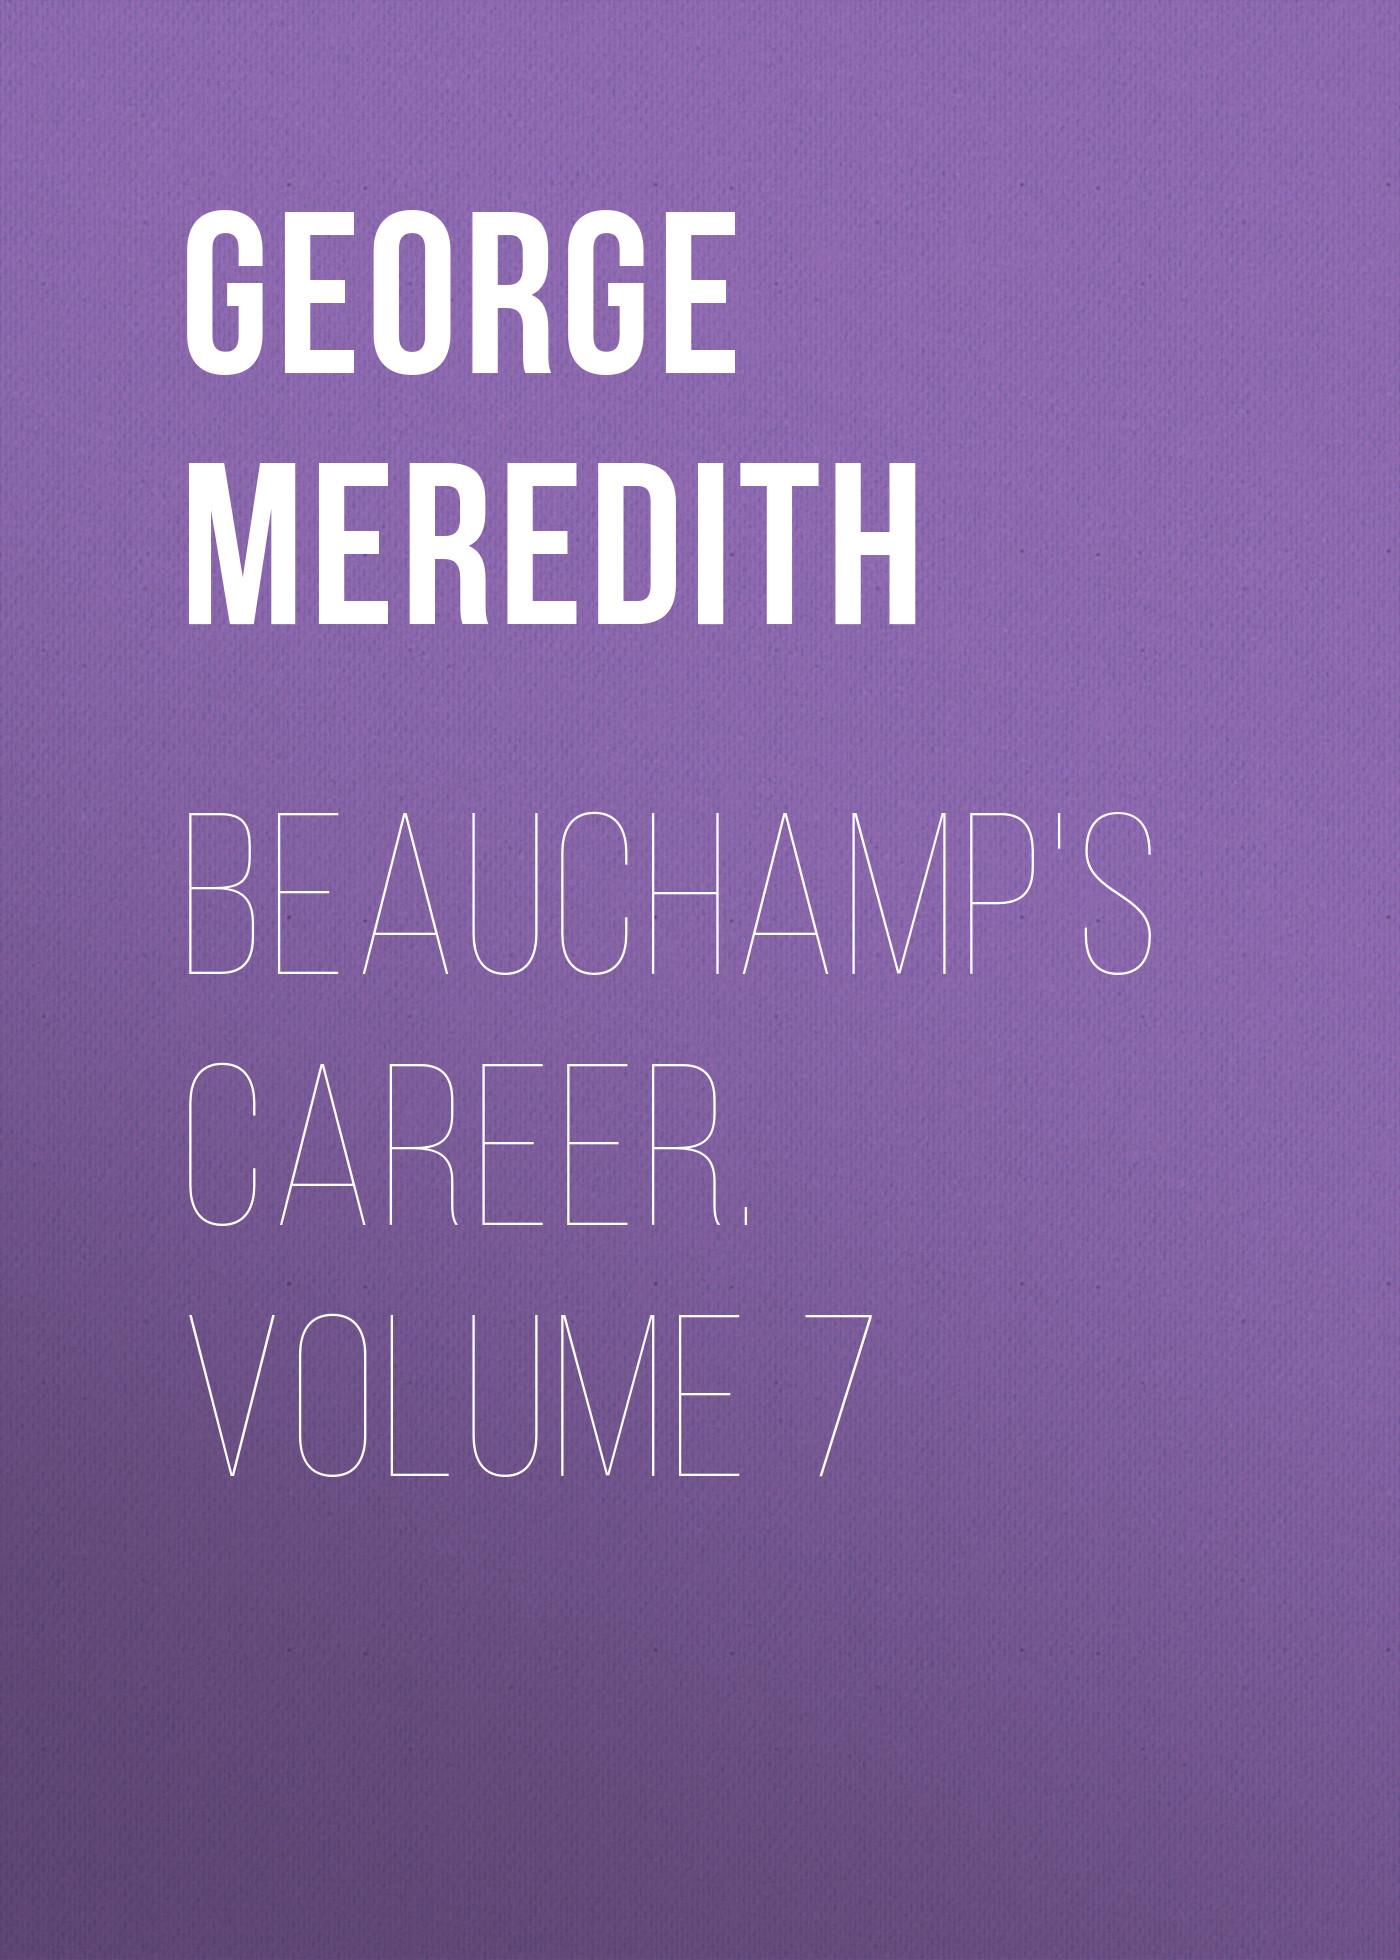 George Meredith Beauchamp's Career. Volume 7 mardock scramble volume 7